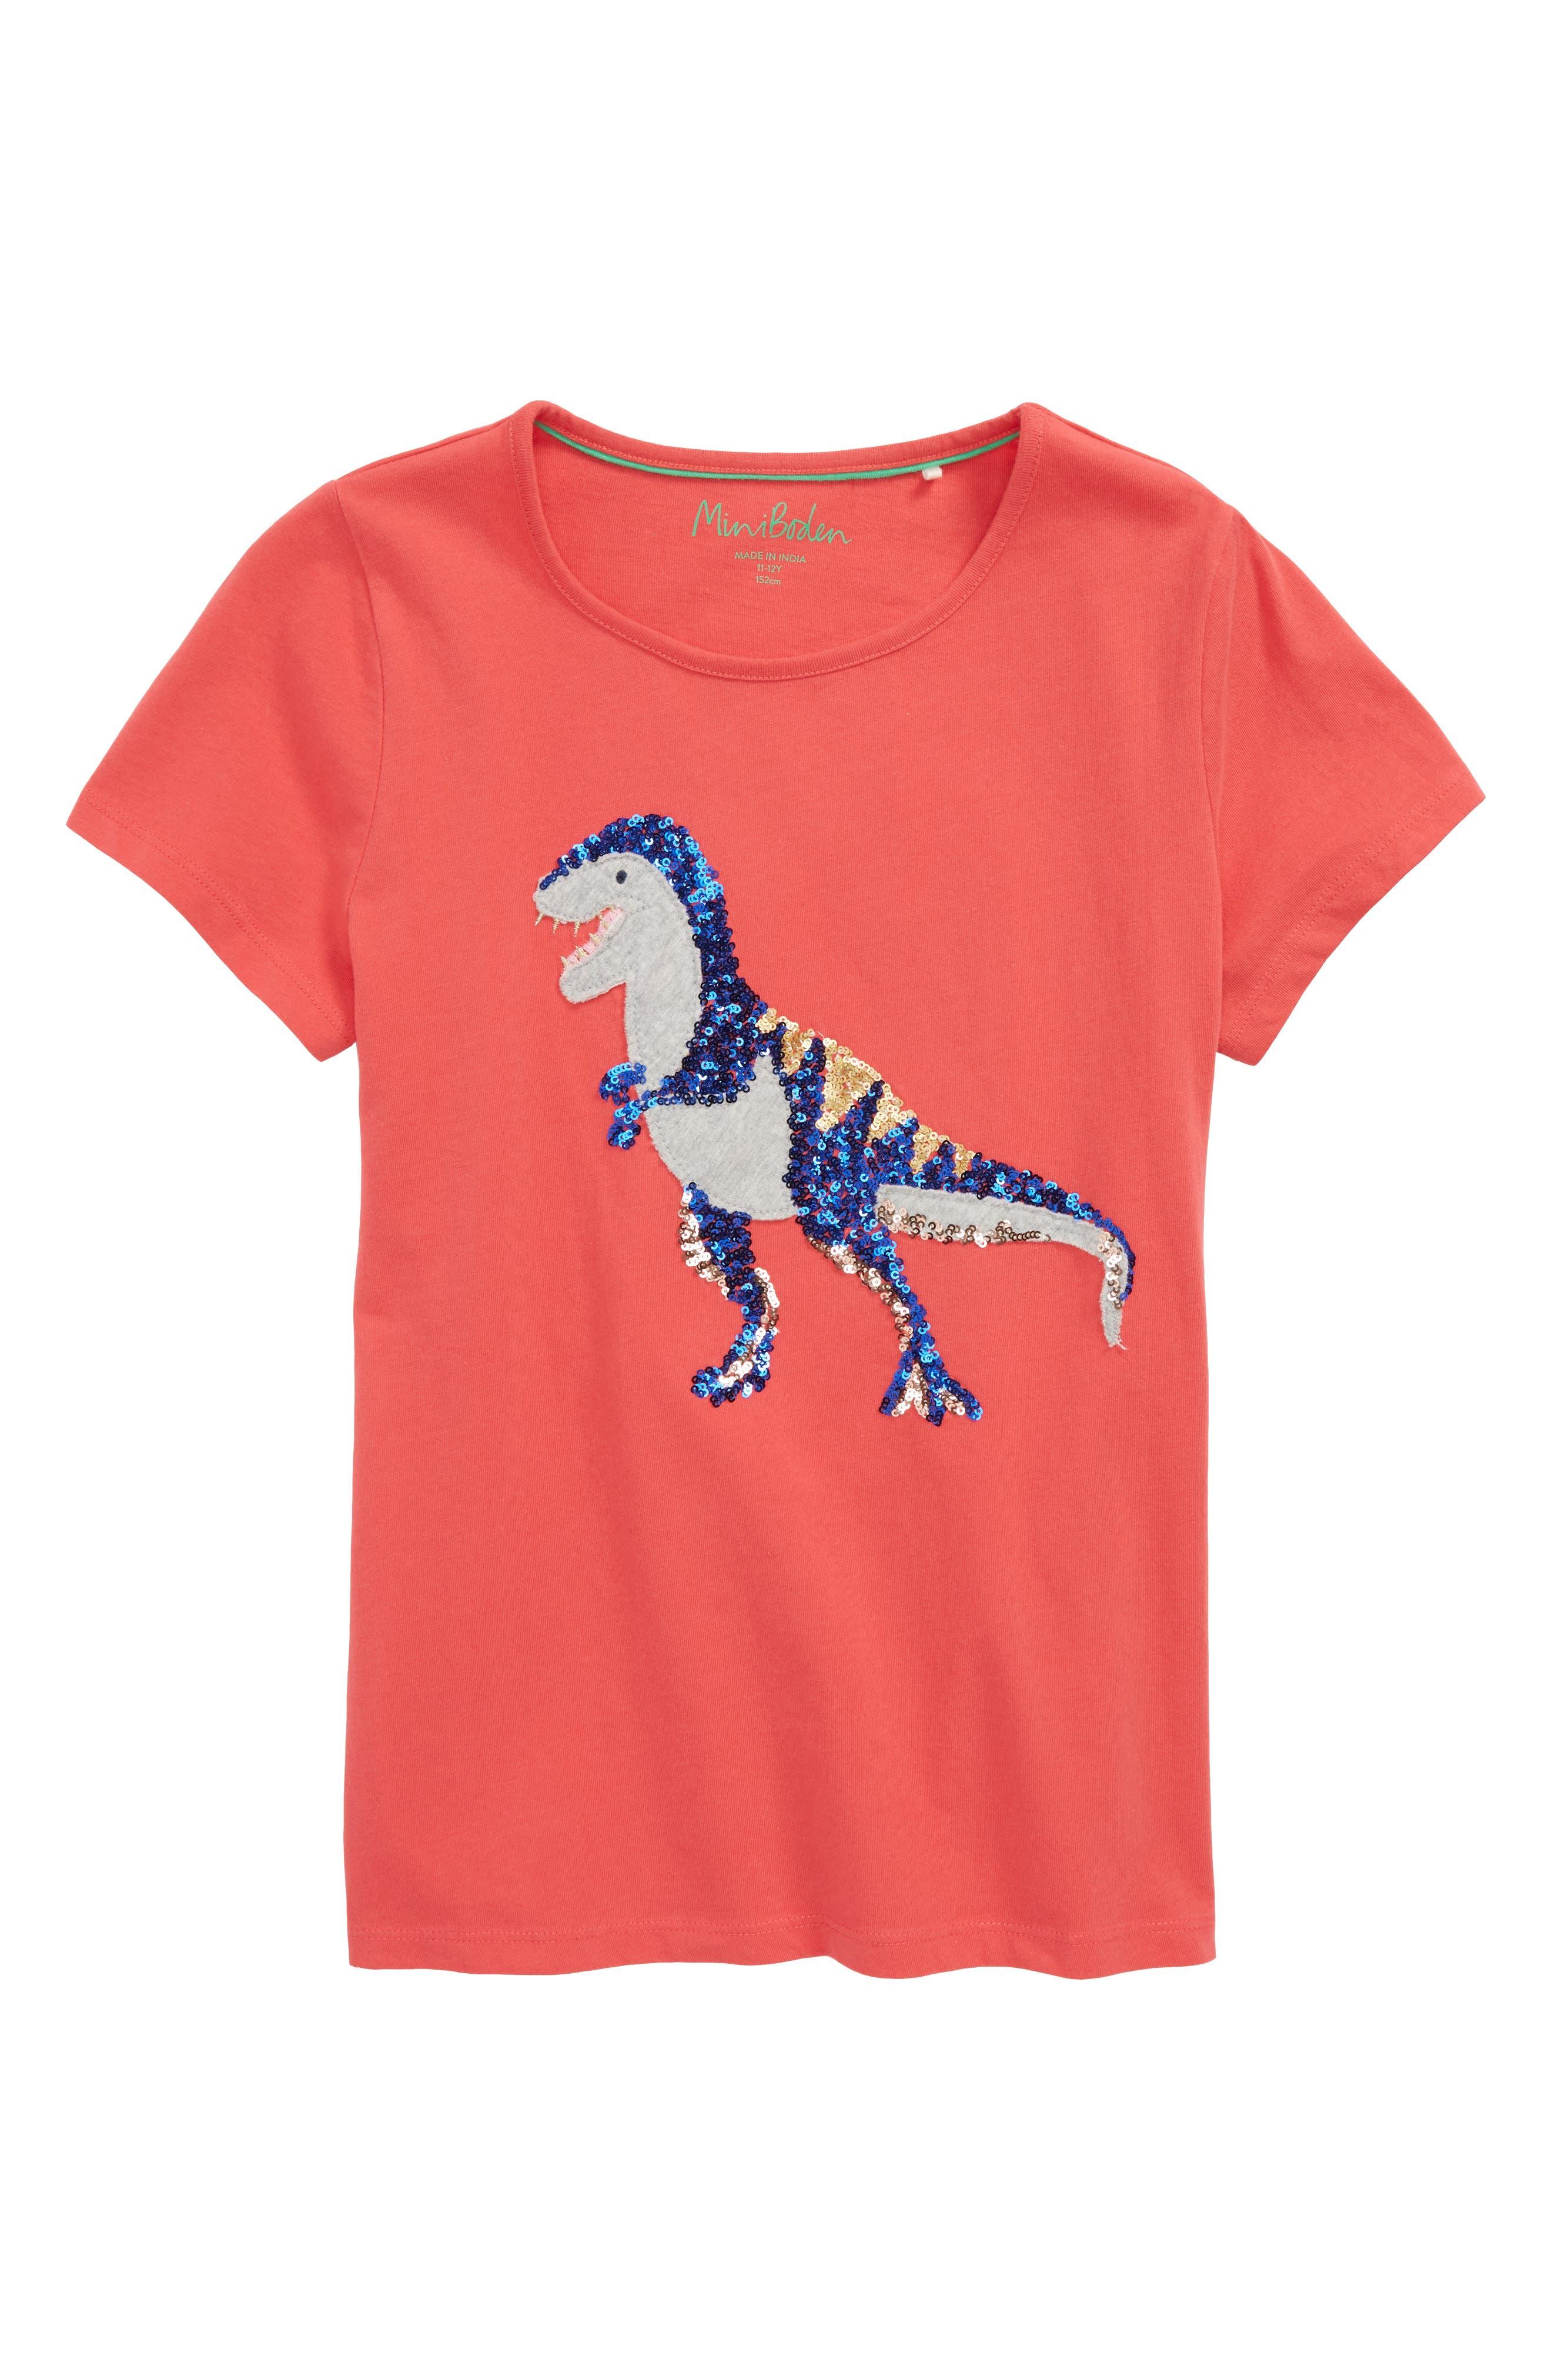 Mini Boden Dinosaur Sequin Embellished Tee (Toddler Girls, Little Girls & Big Girls)